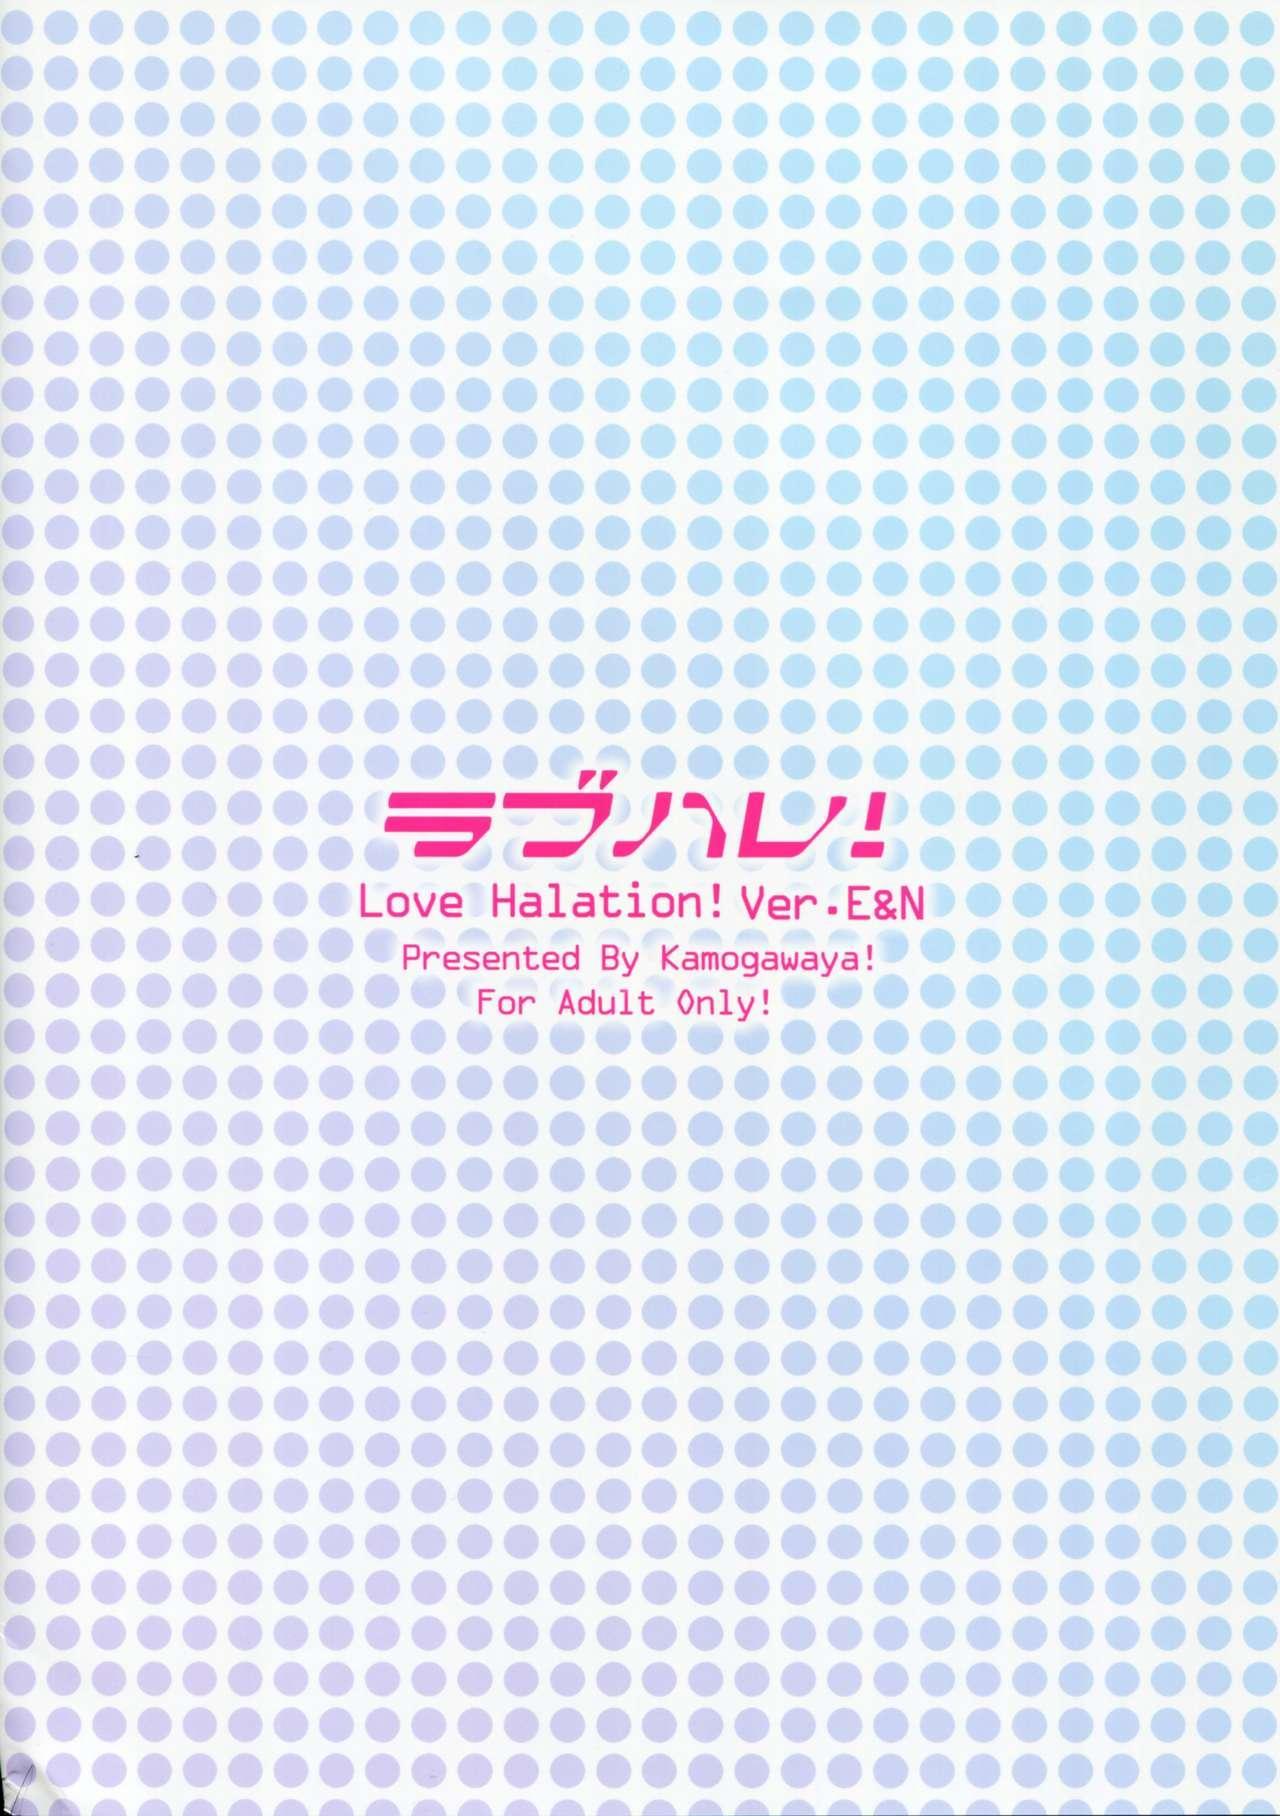 LoveHala! Love Halation! Ver.E&N 2